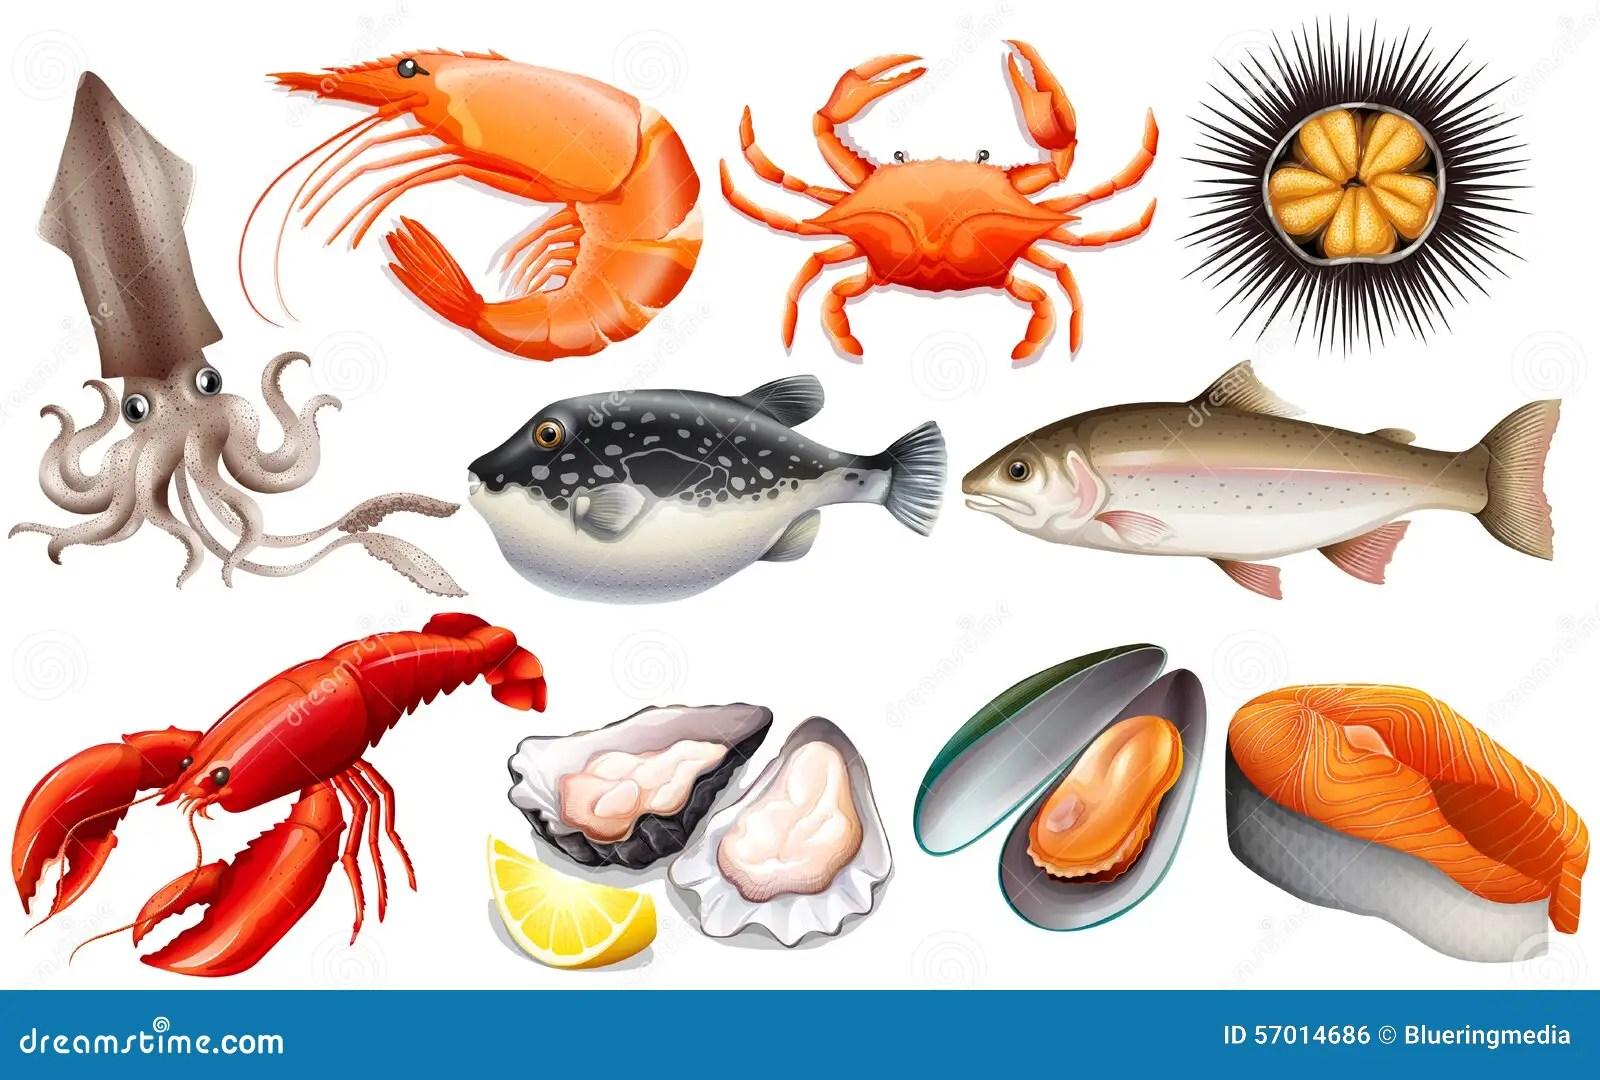 hight resolution of seafood